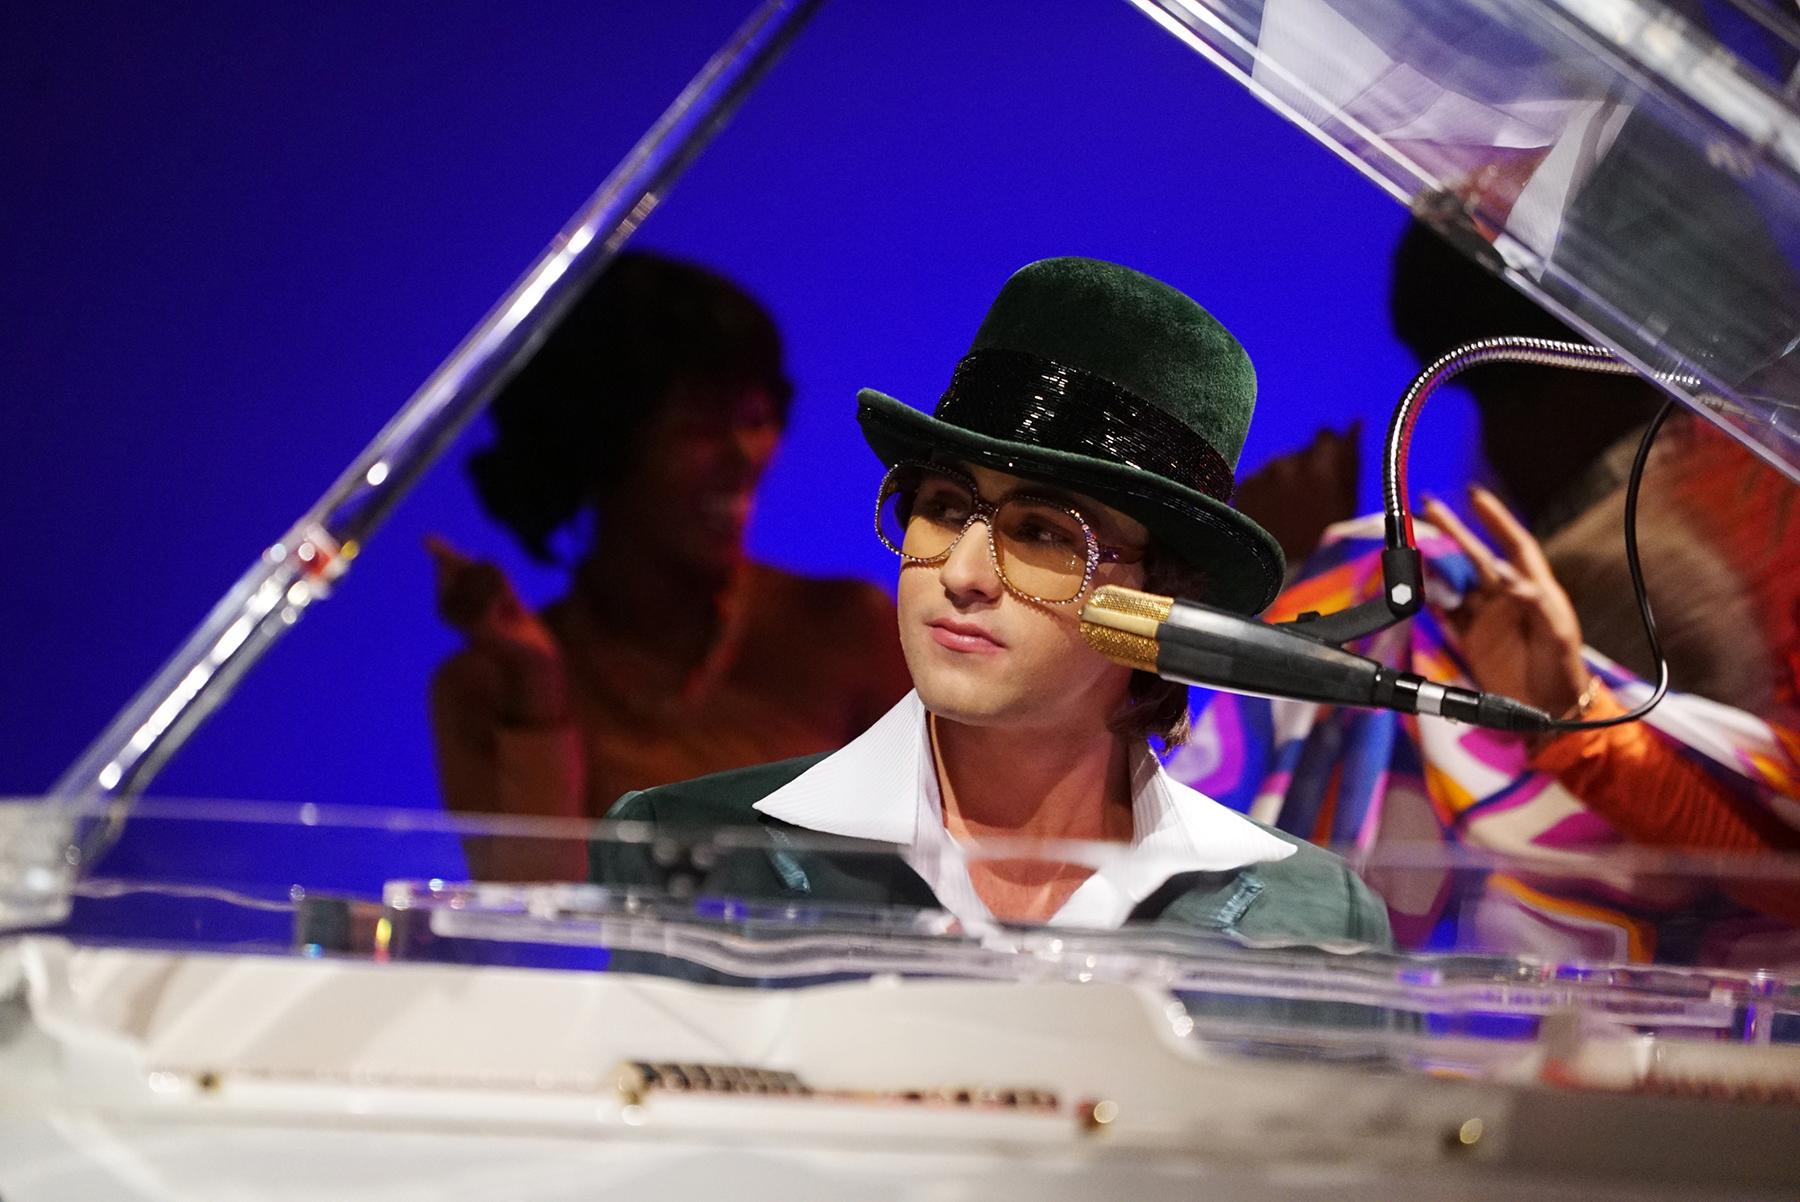 Hudson Thames as Elton John